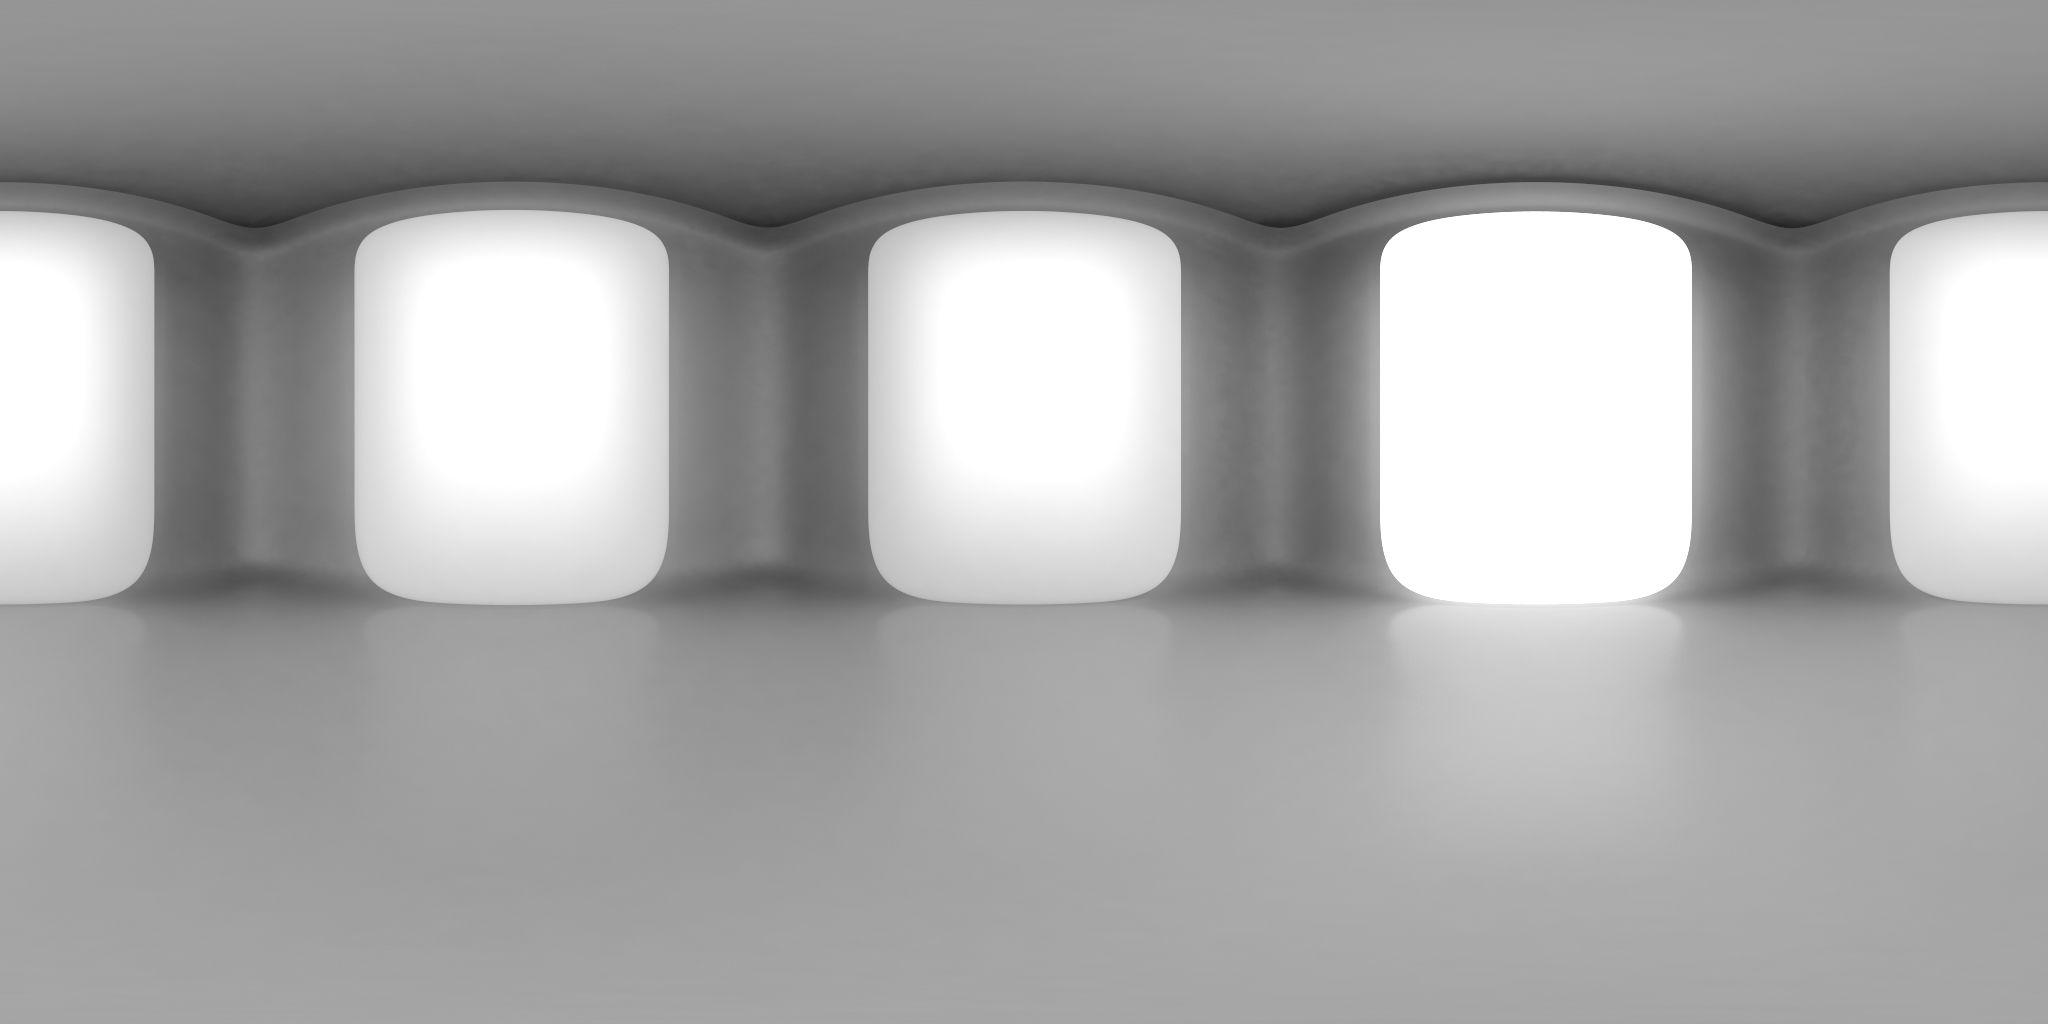 1000+ images about HDRI on Pinterest | Mondays, Roof light